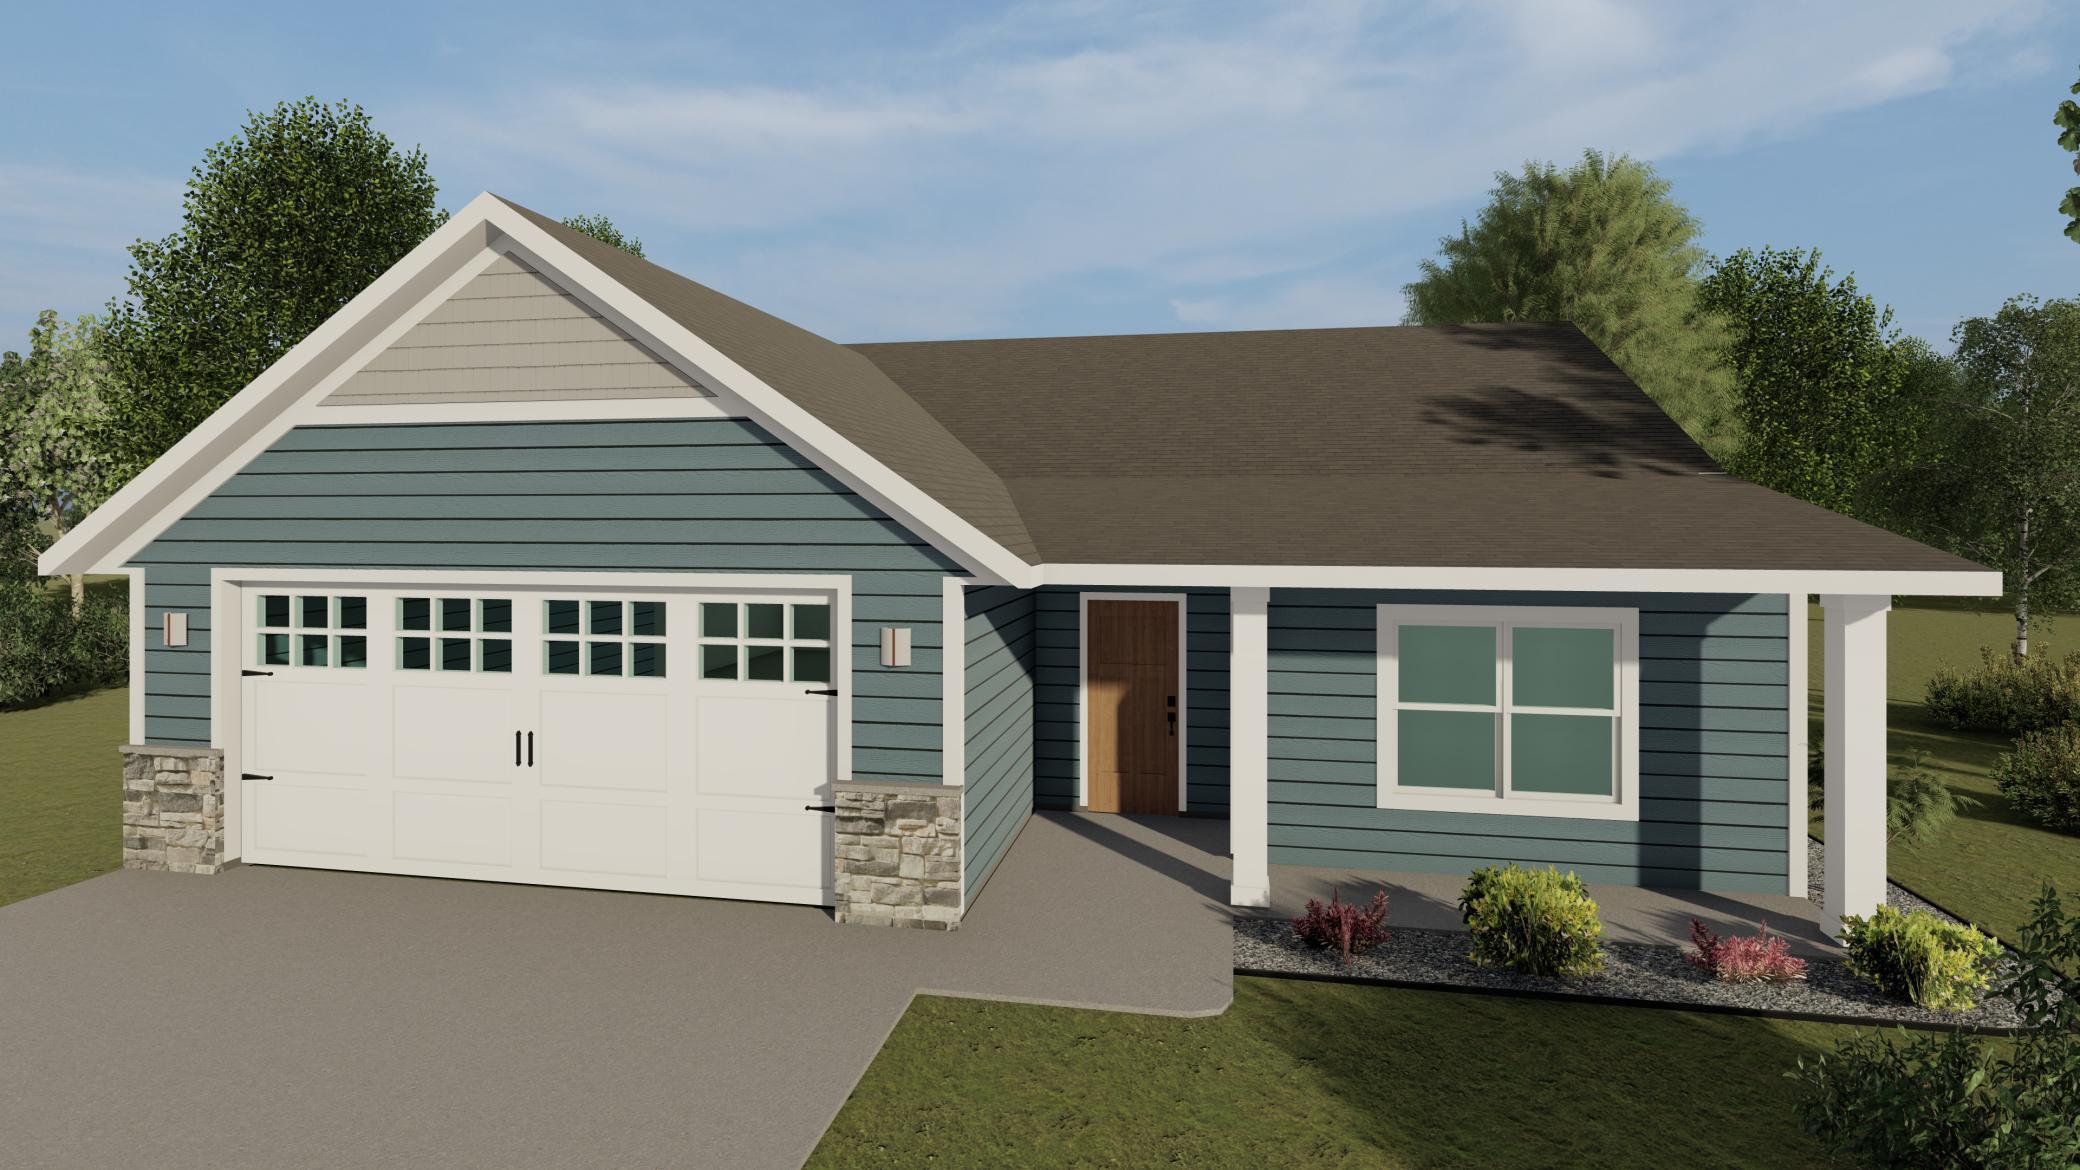 Lot24 Blk1 Jessie View Drive Property Photo 1